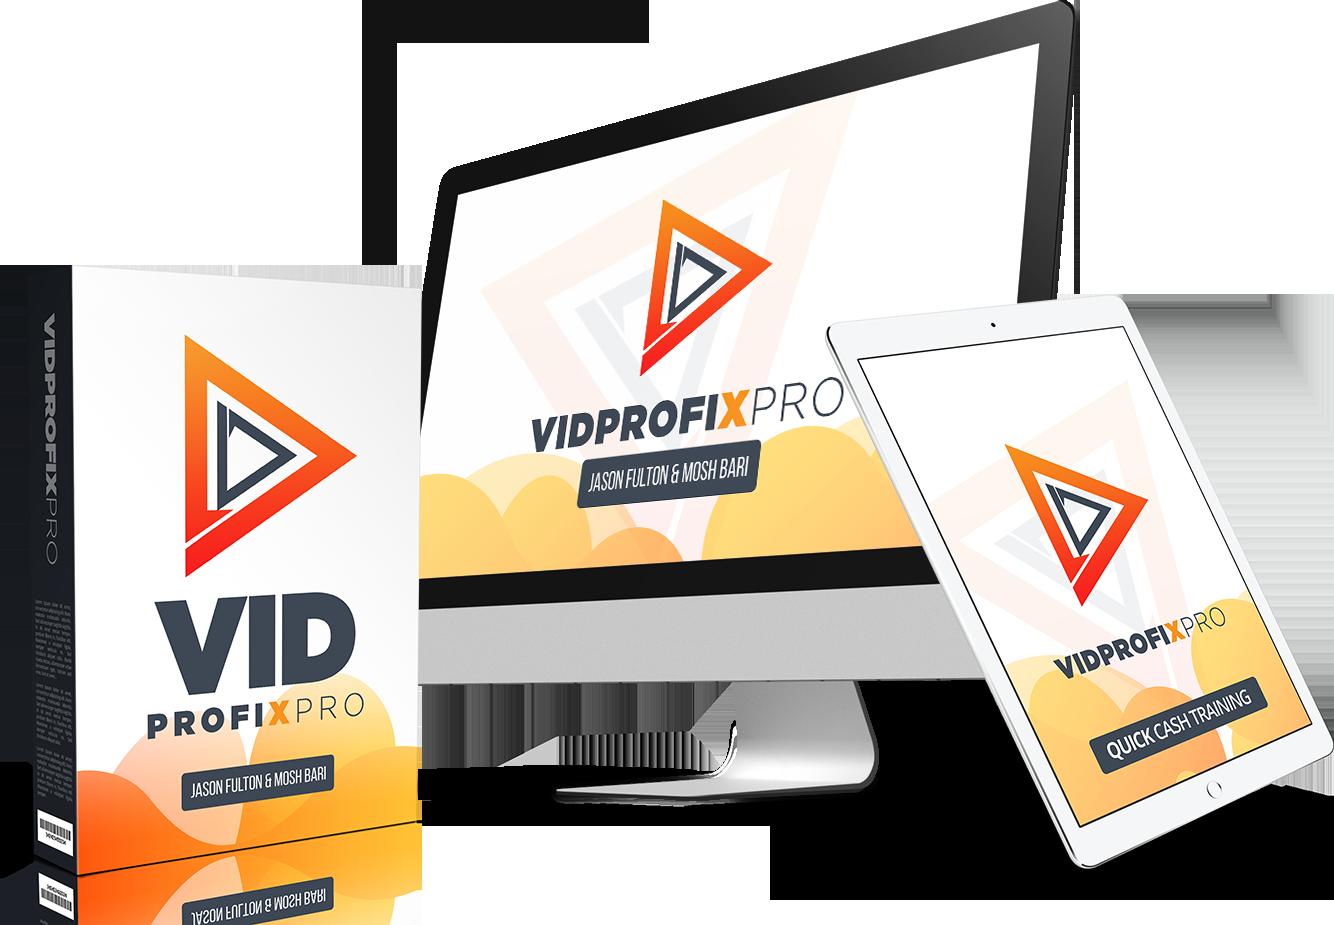 VidProfixPro